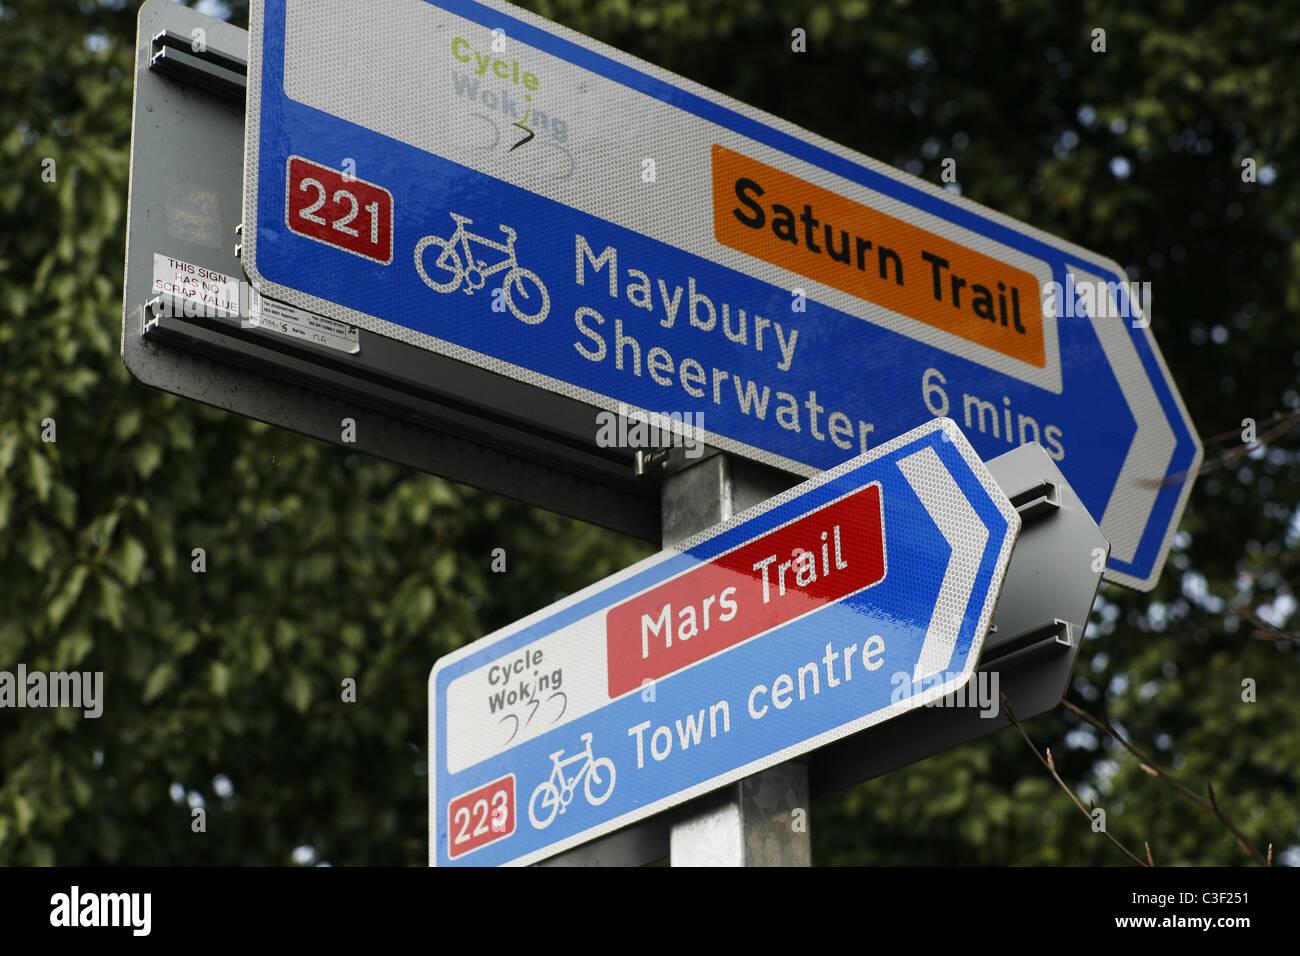 Cycle way signpost Mars Saturn trail Woking Surrey England - Stock Image